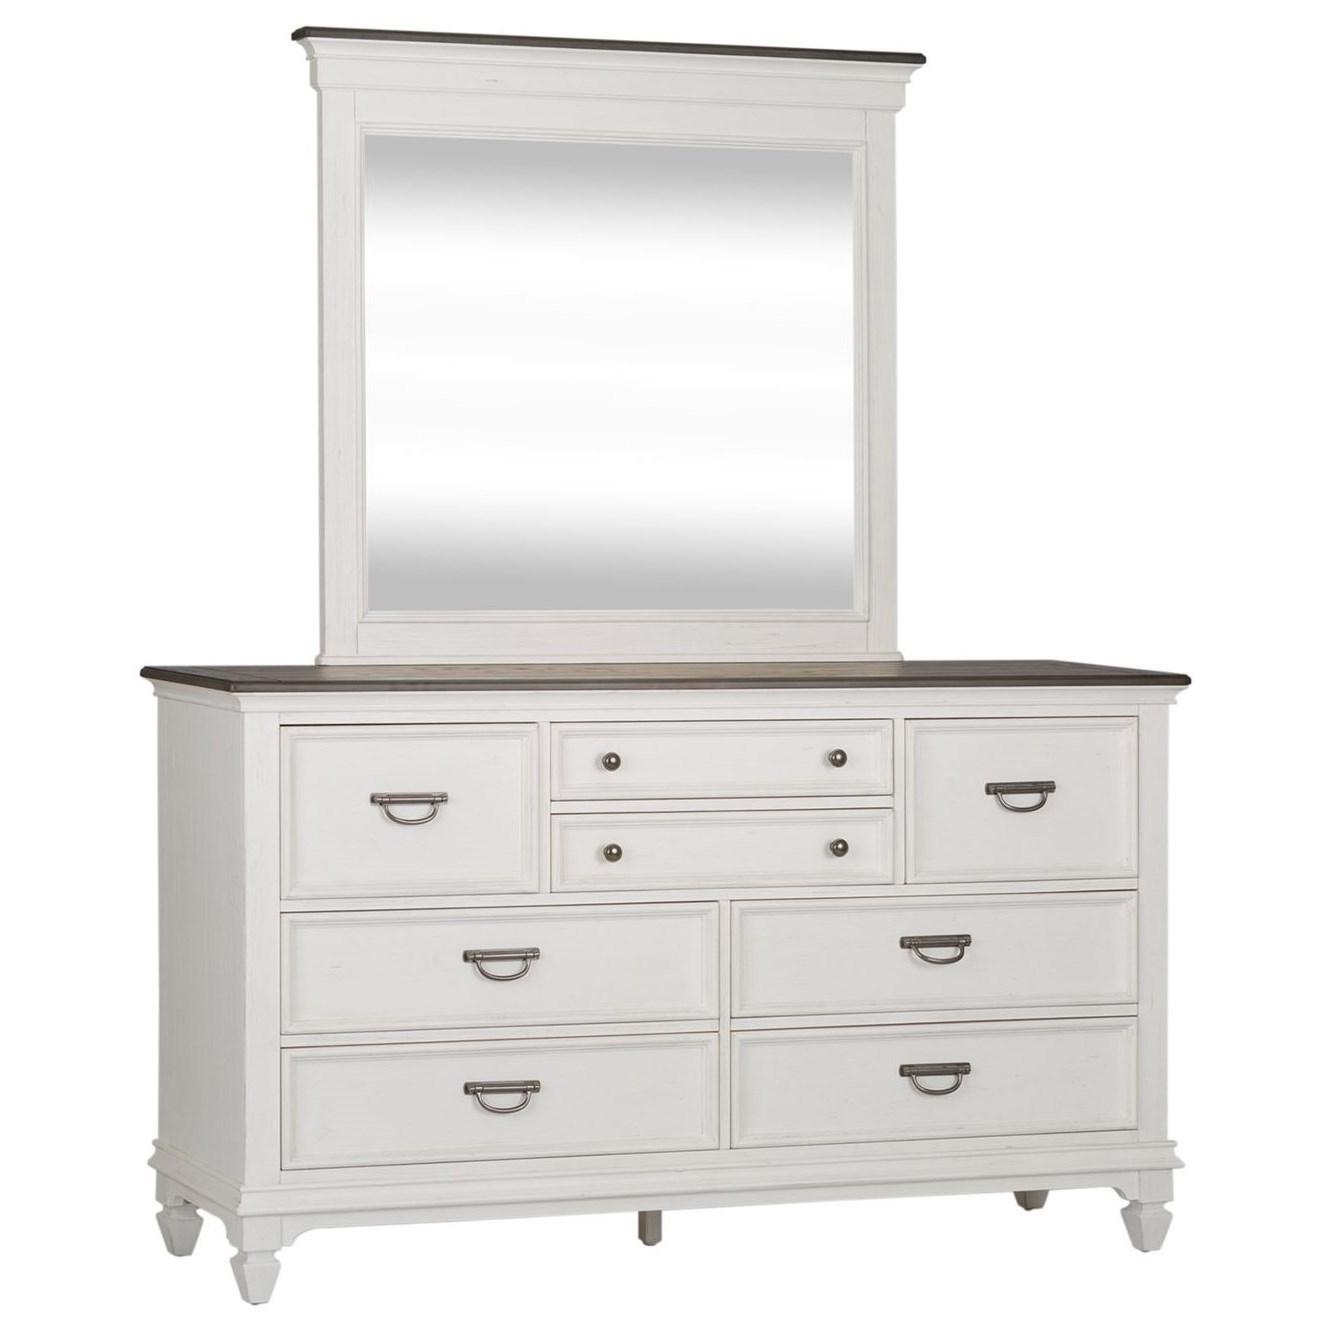 Allyson Park Dresser & Mirror  by Sarah Randolph Designs at Virginia Furniture Market